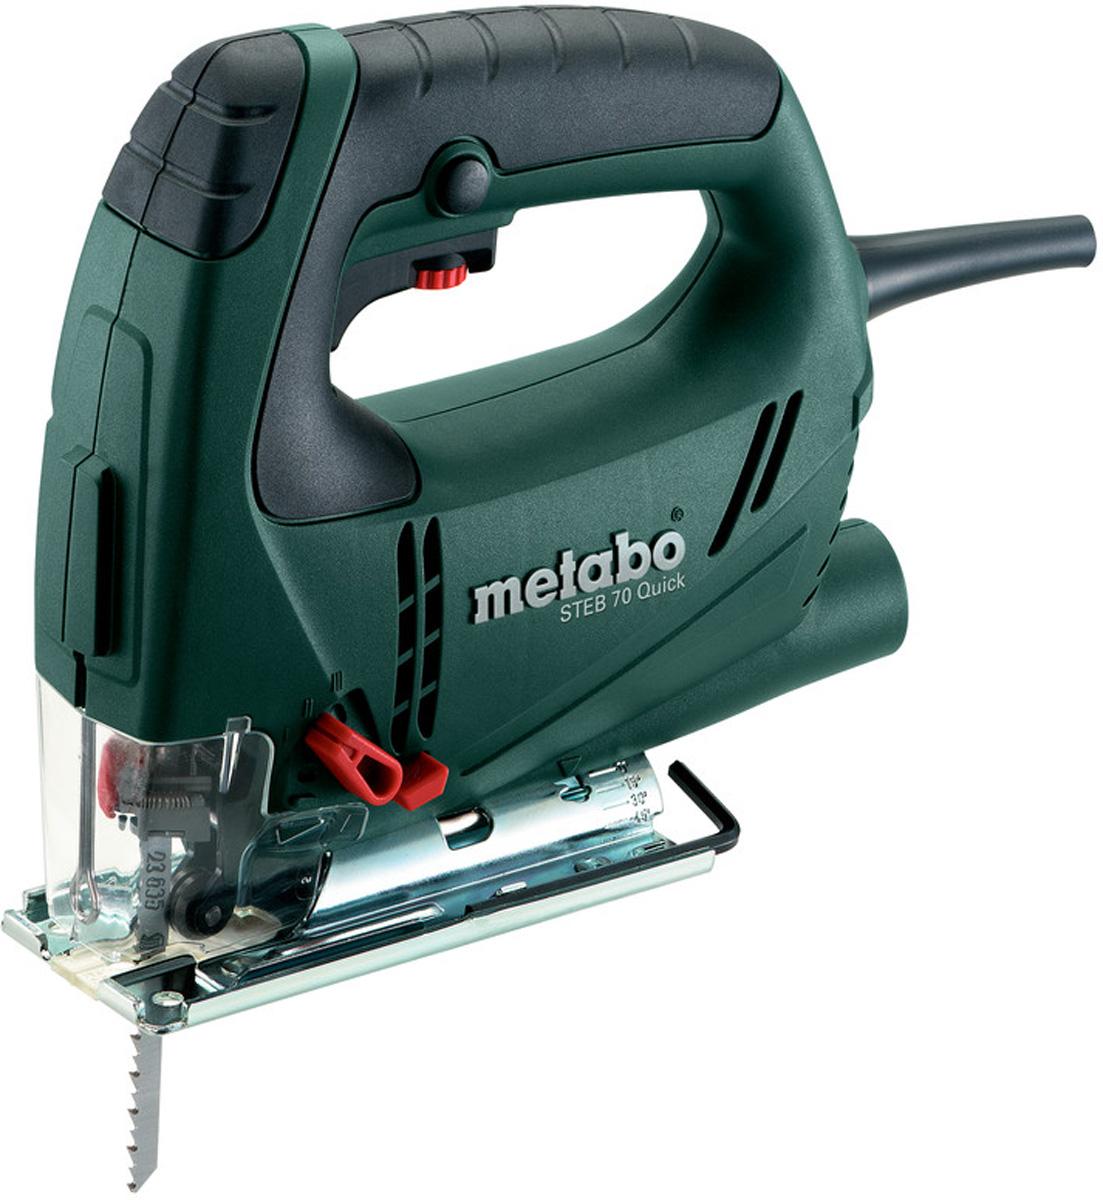 Лобзик электрический Metabo STEB 70 Quick. 601040500 цена